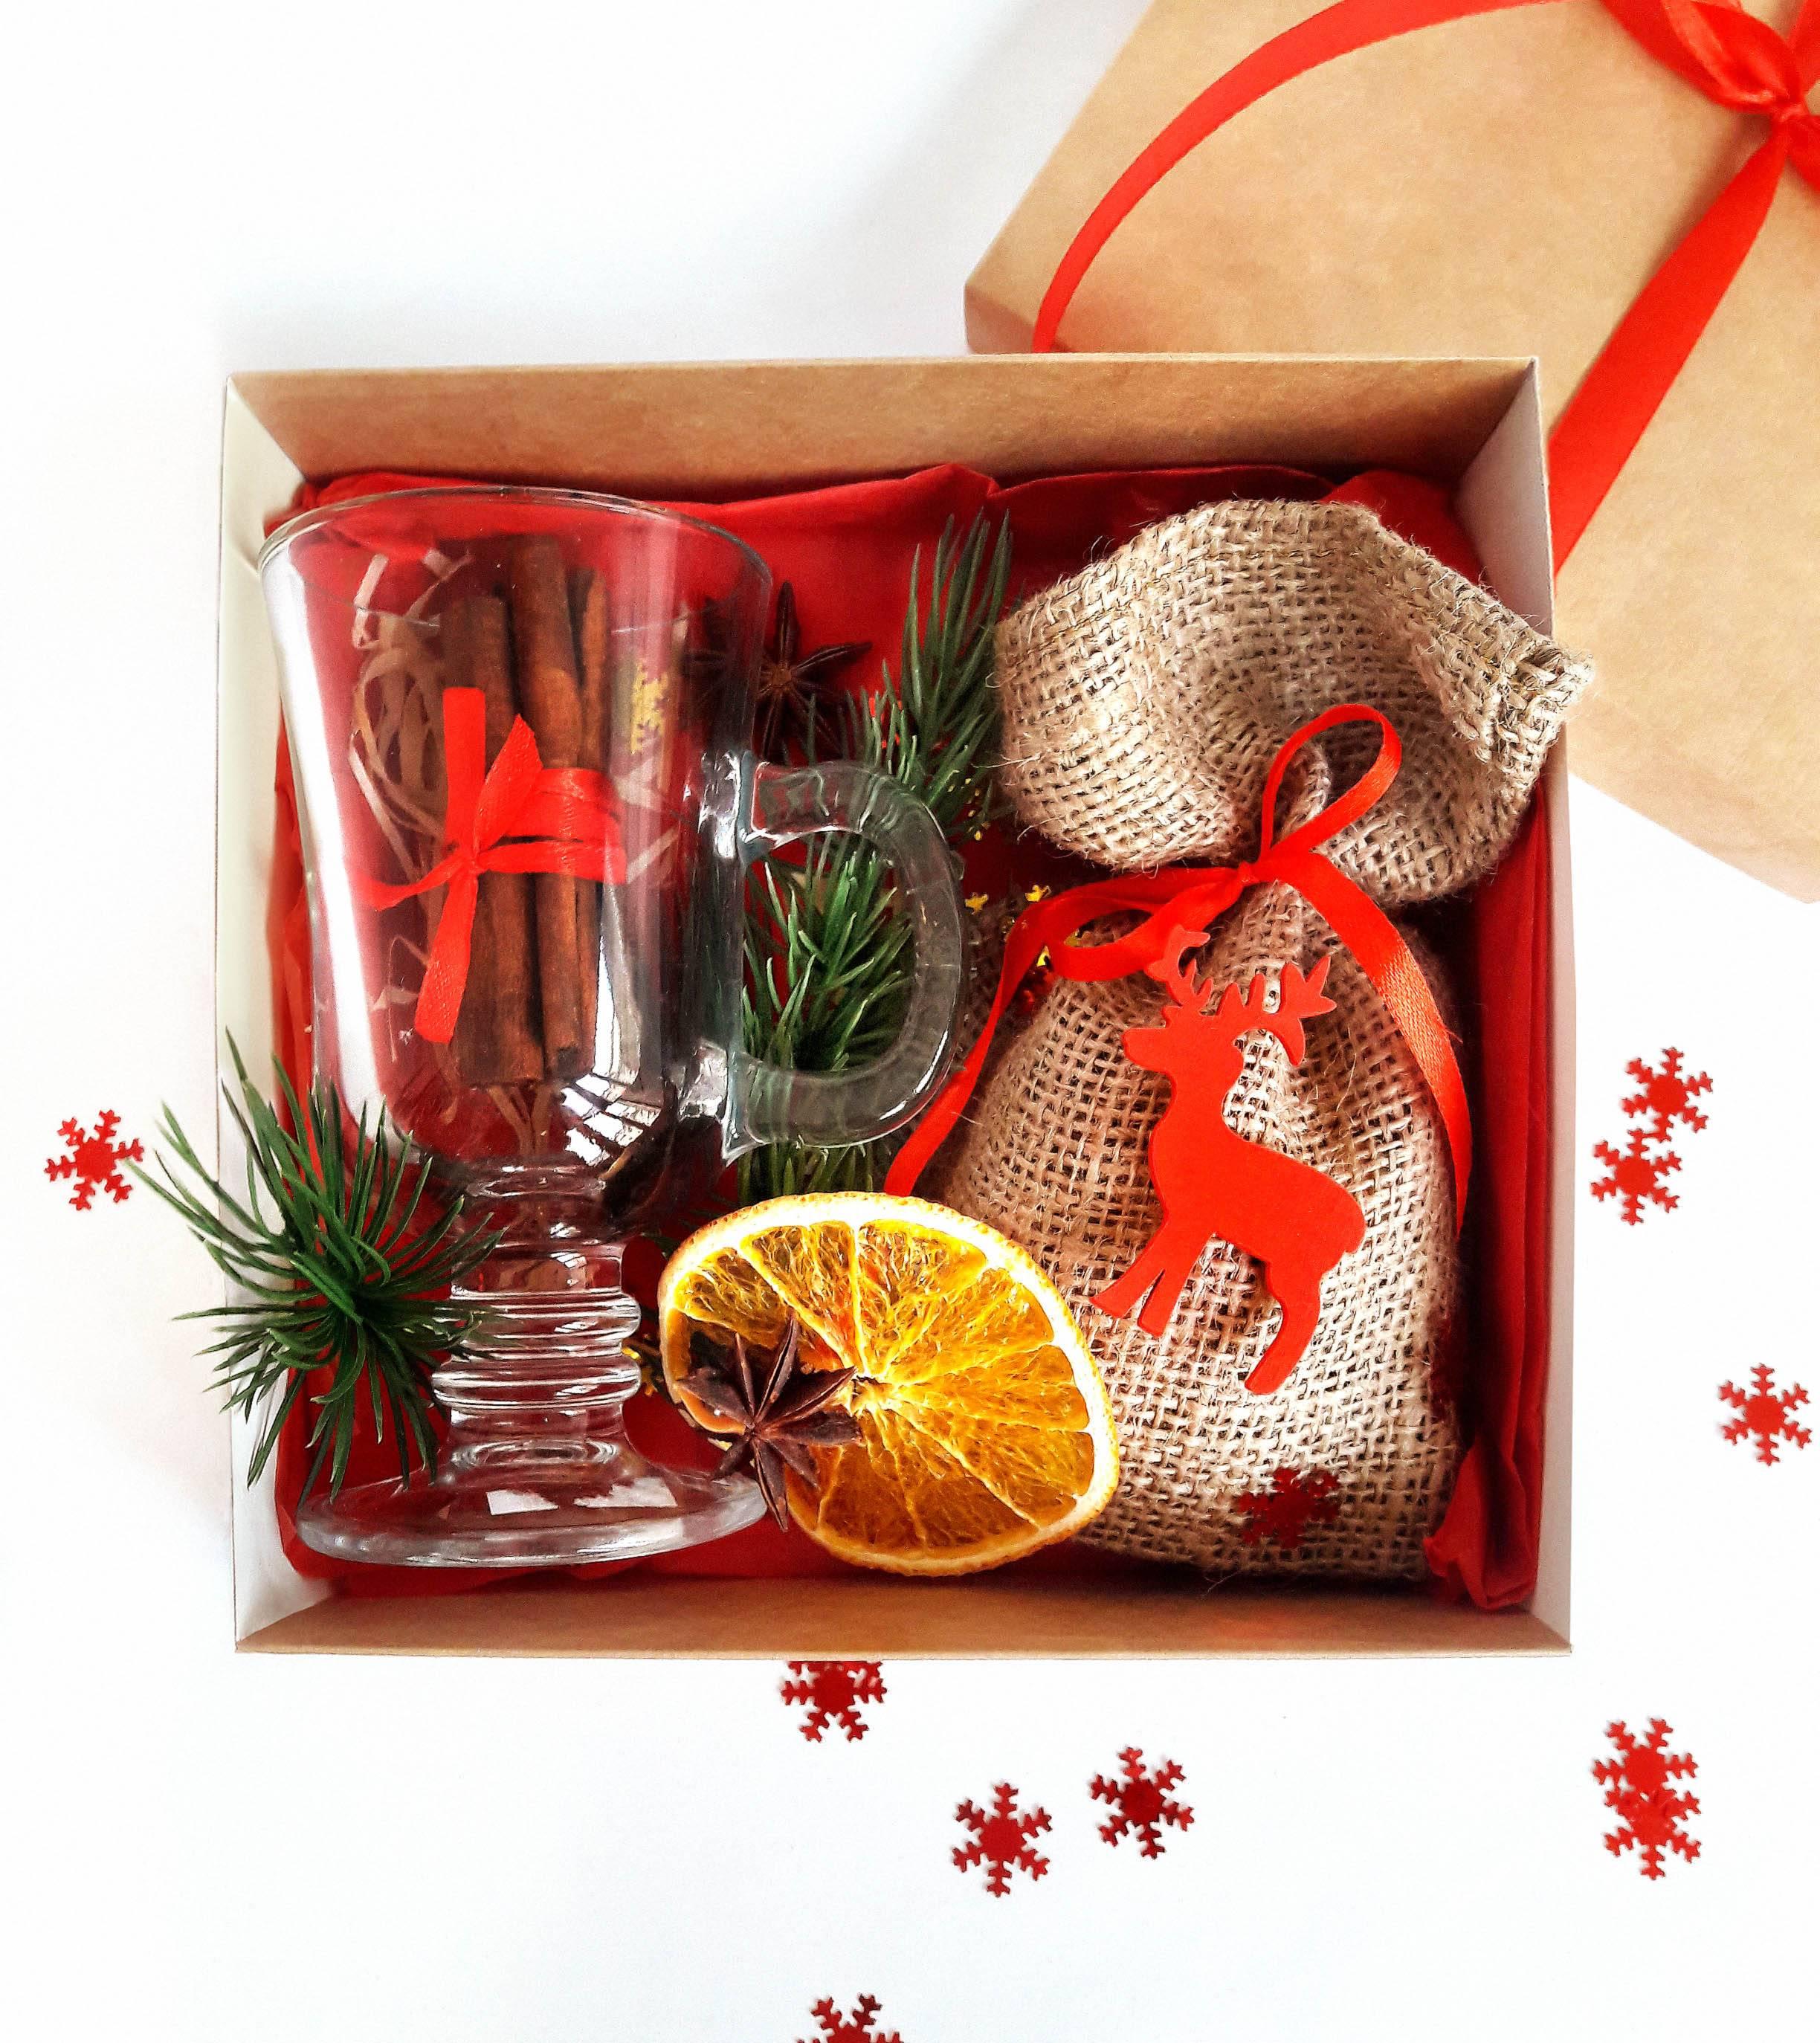 Съедобные подарки на новый год | волшебная eда.ру